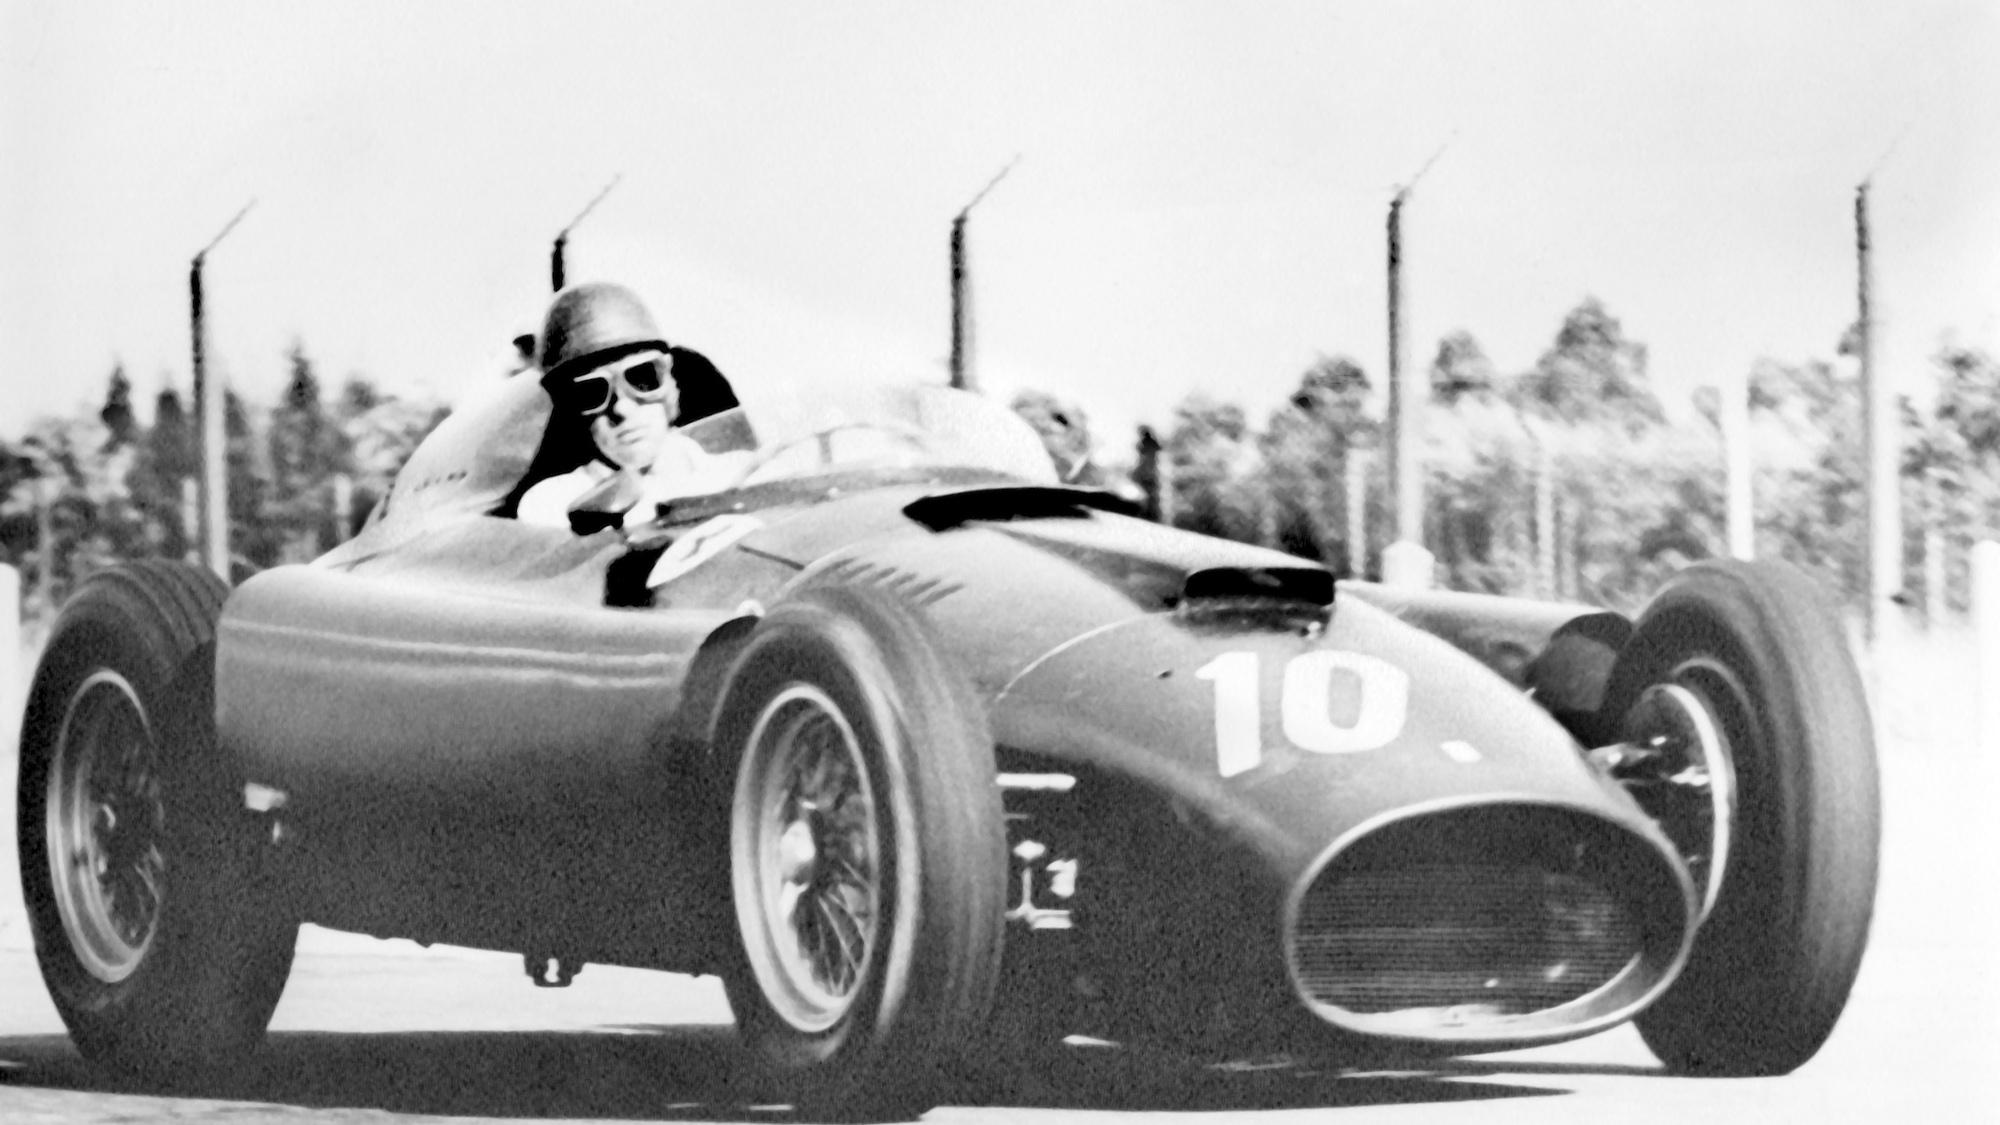 Peter Collins in the 1957 Argentinian Grand Prix for Ferrari